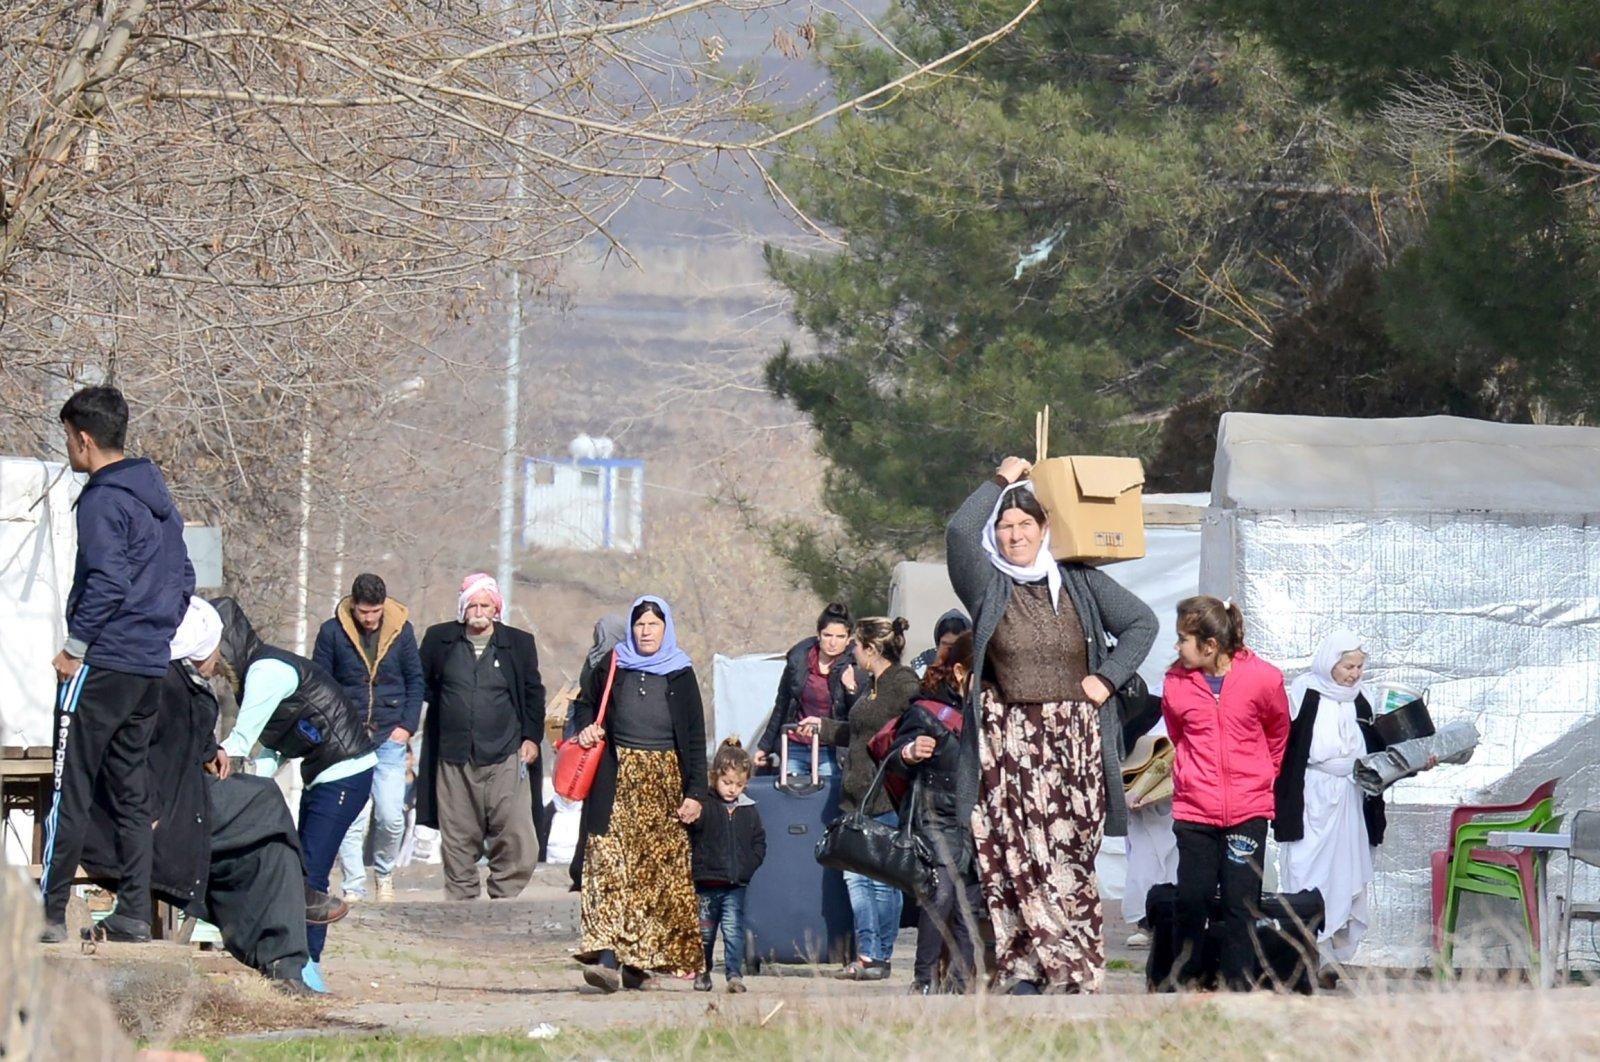 Yazidis, who fled from Daesh oppression in Iraq's Sinjar, carry their belongings in southeastern Turkey's Diyarbakır, Jan. 3, 2017. (AFP Photo)